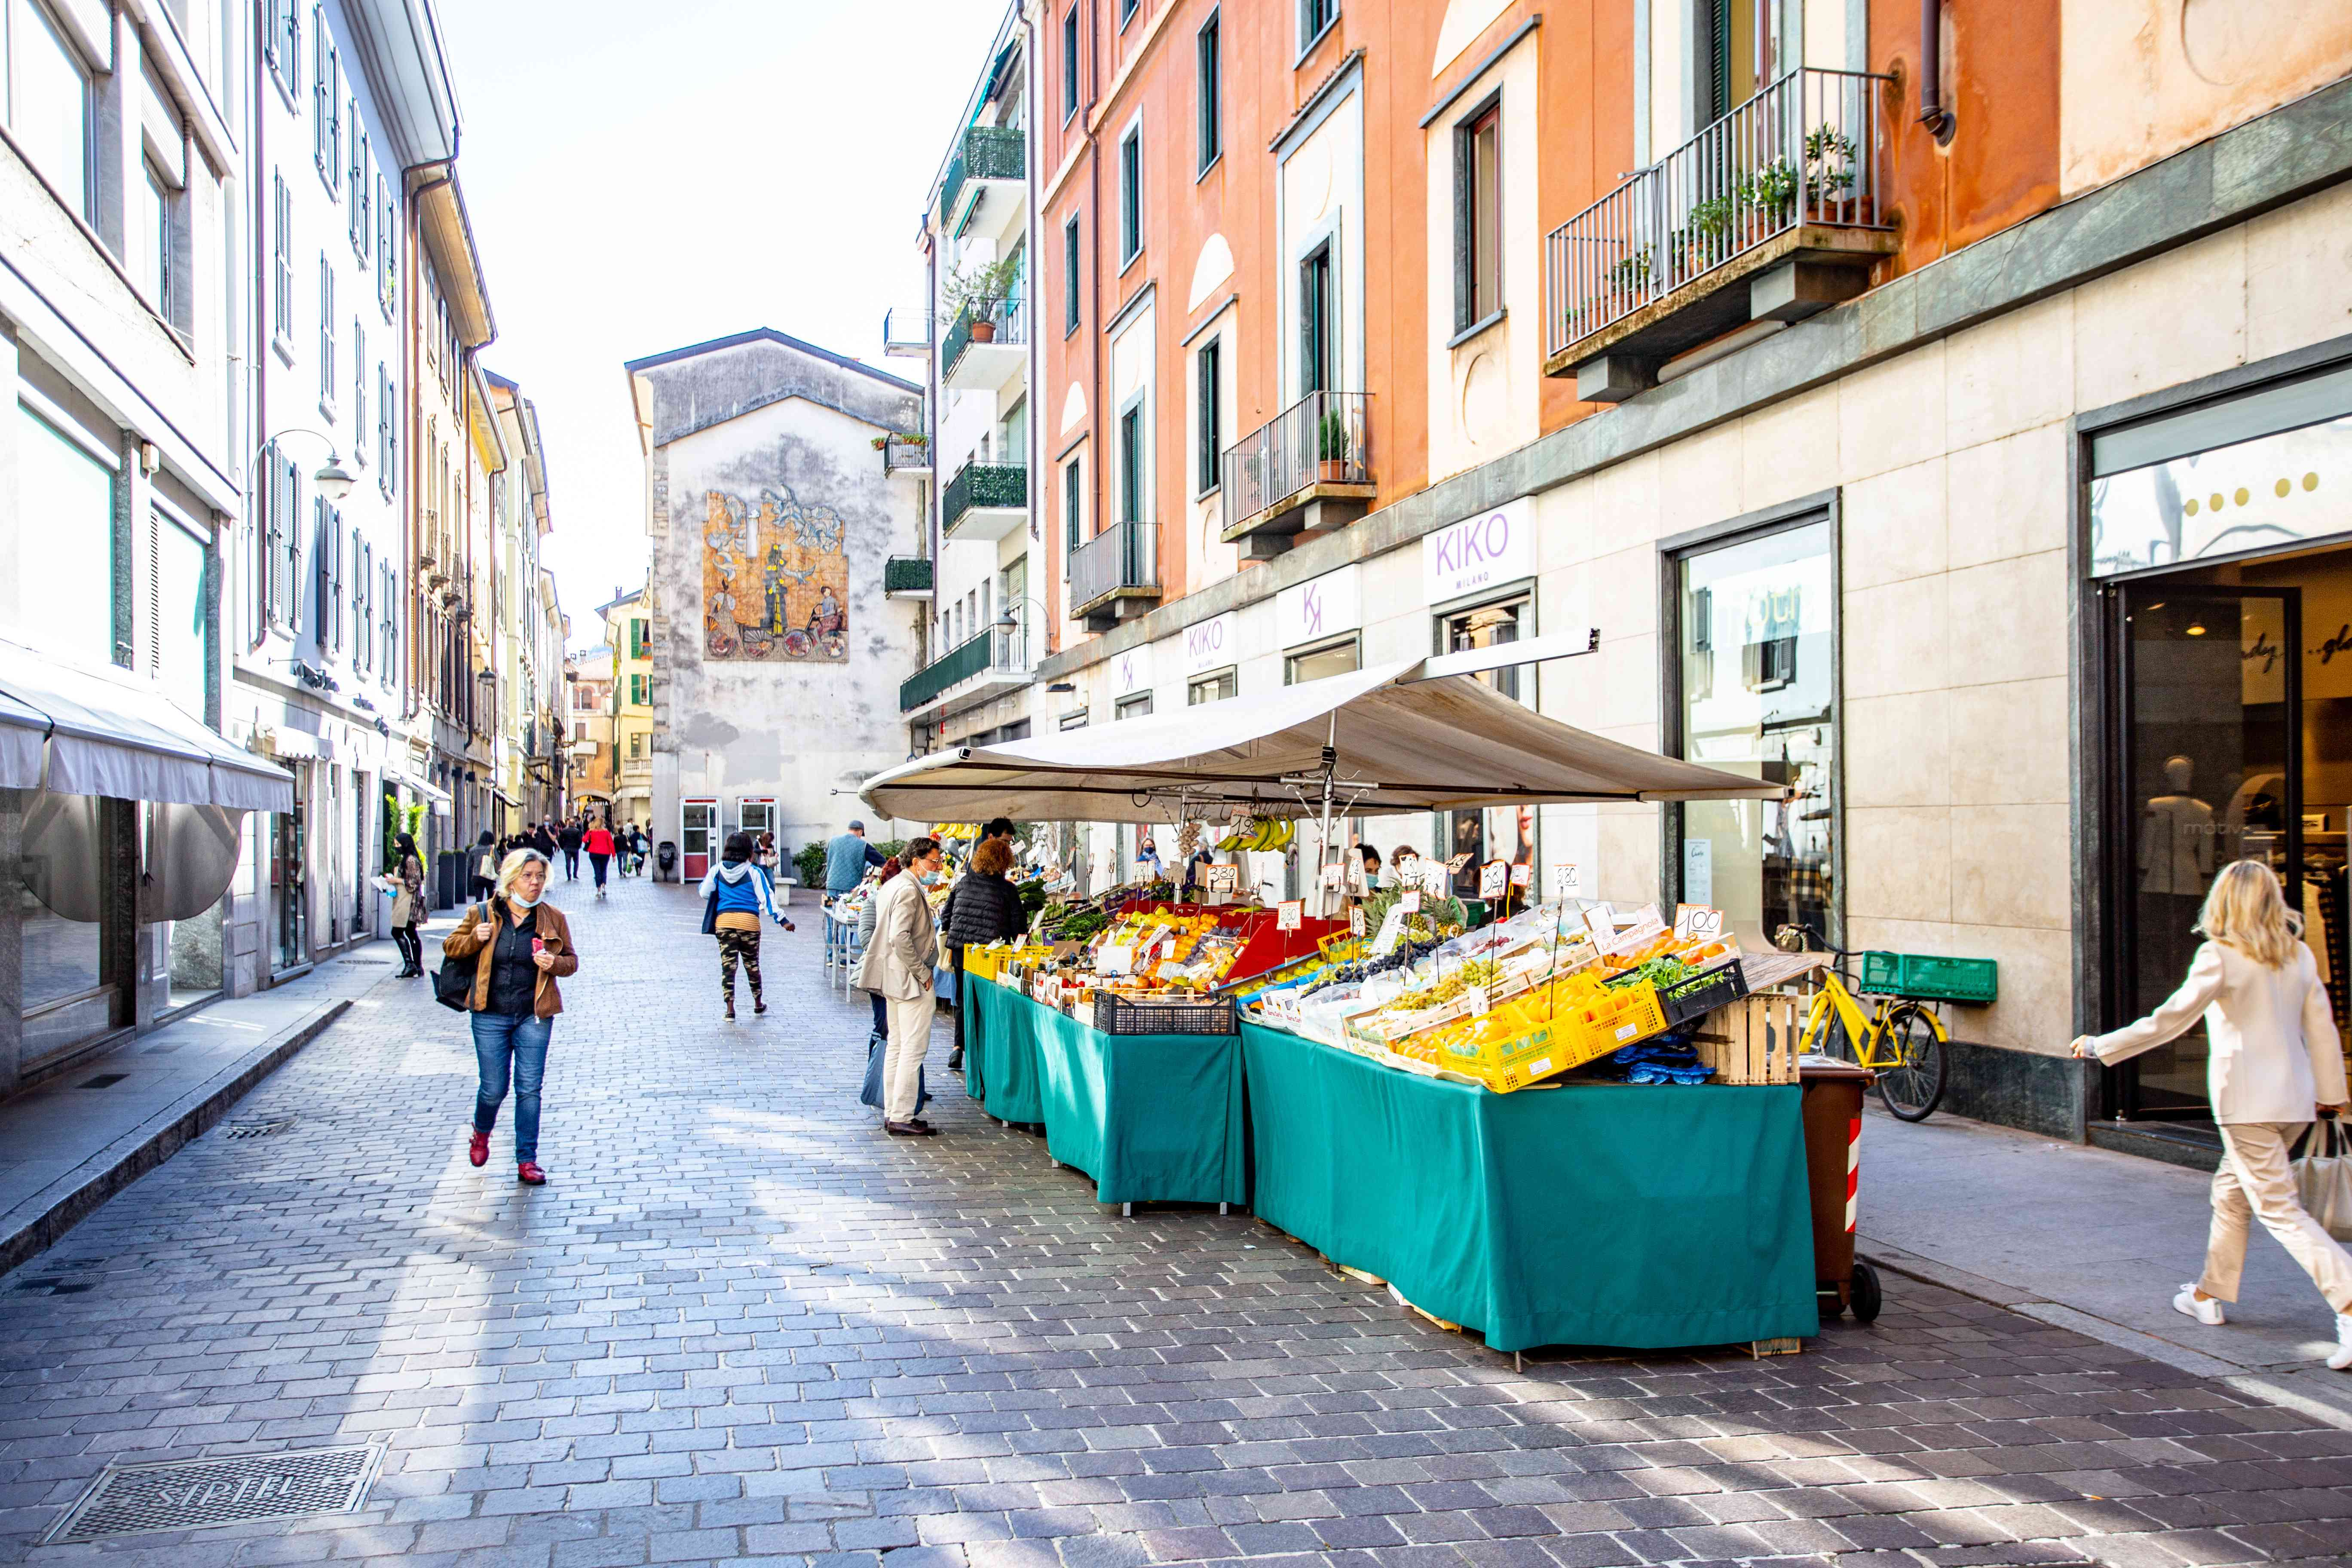 City of Como, Lombardy, Italy